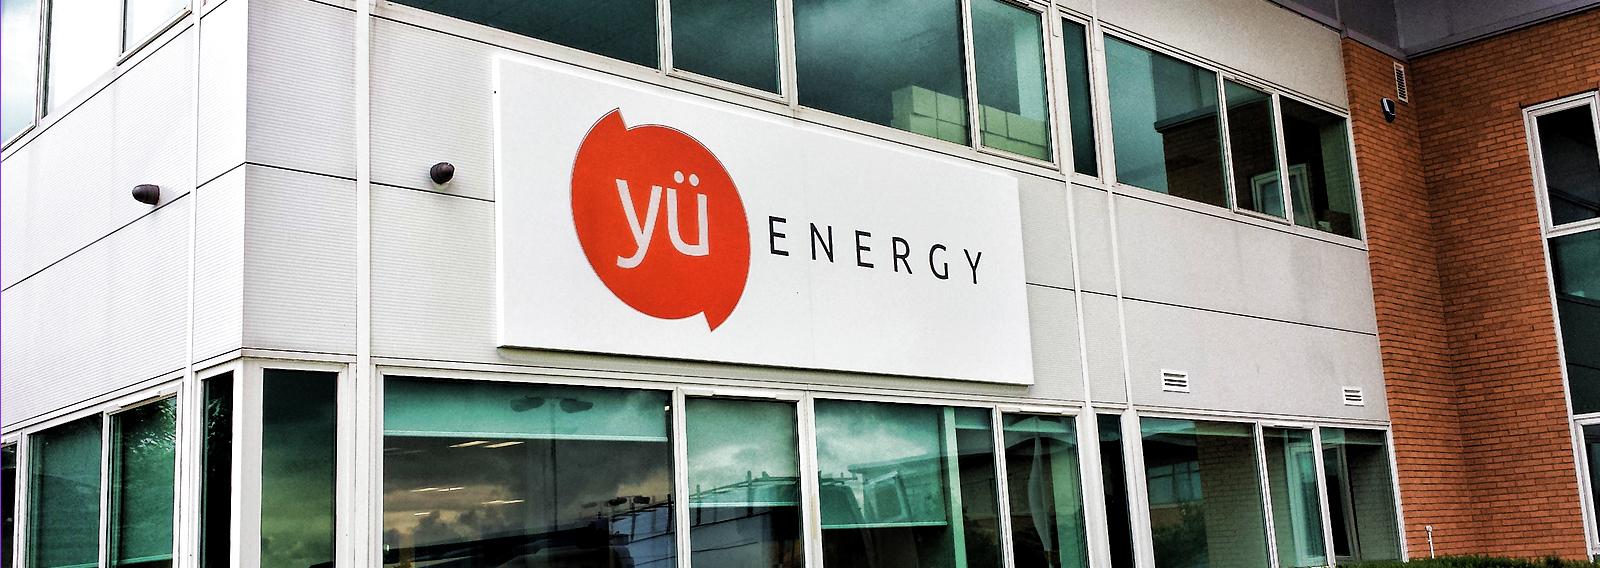 yu energy panar